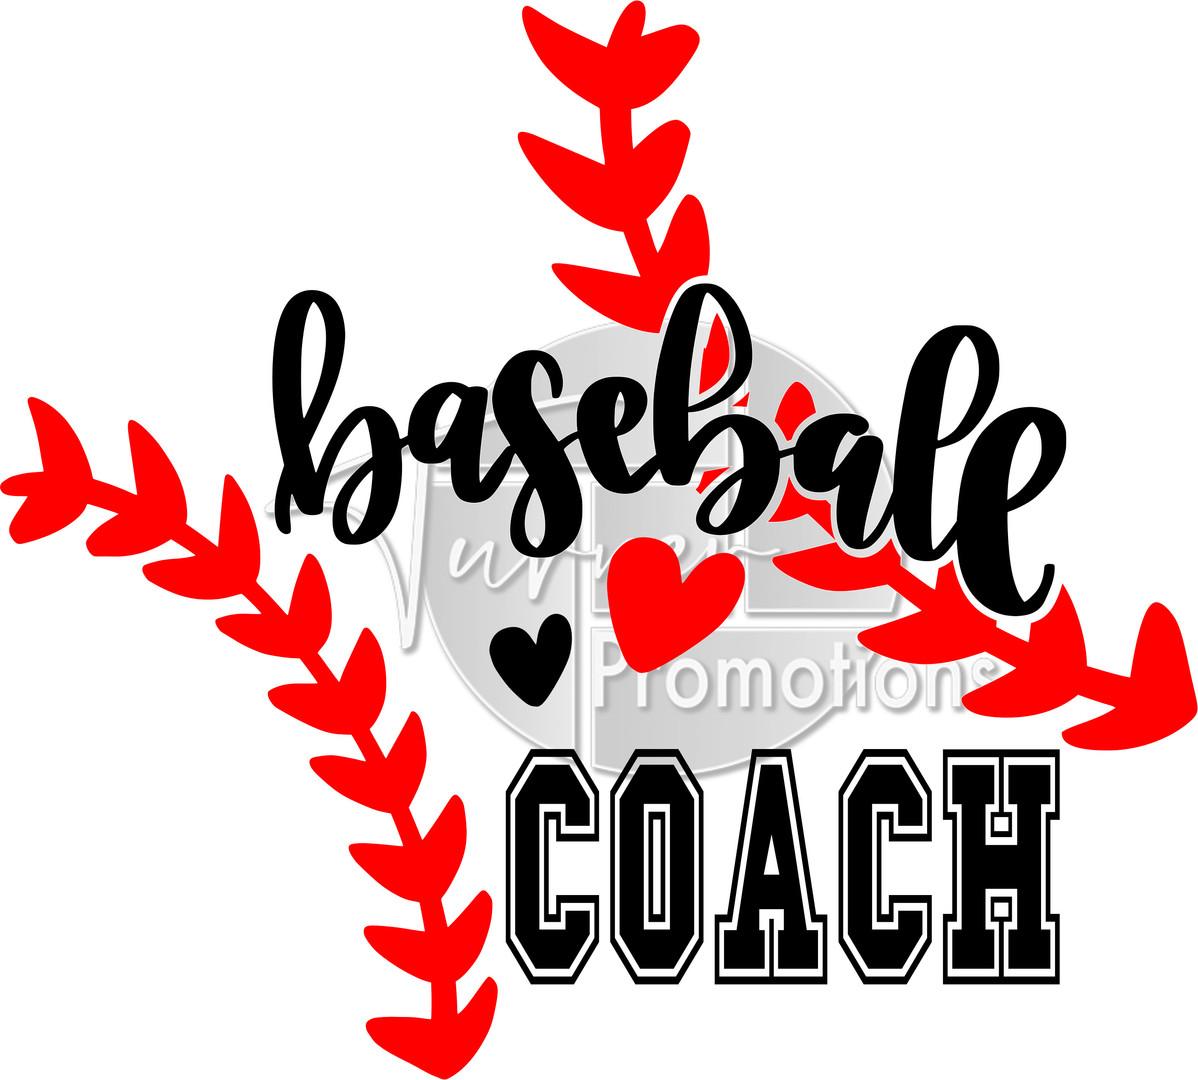 baseballcoach2.jpg